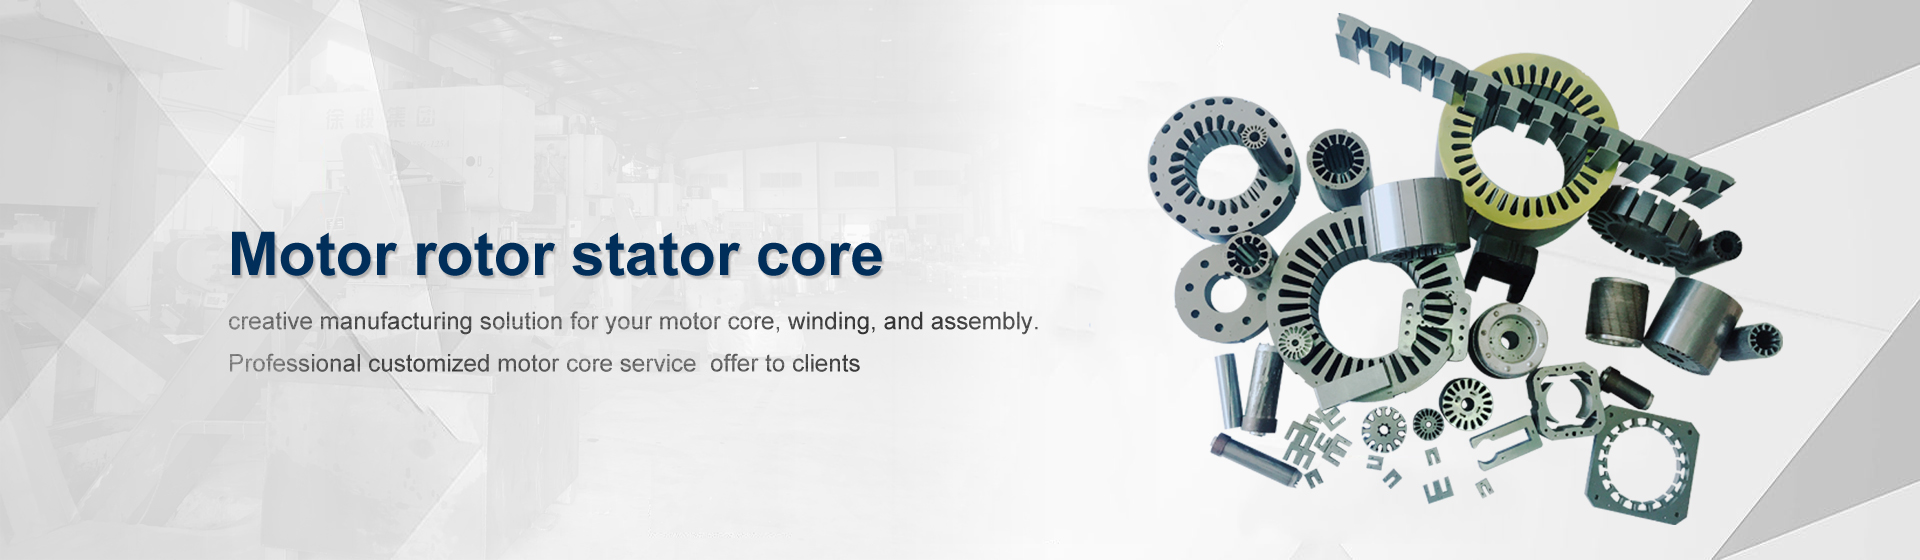 Ningbo Imcore Machinery & Electronics Co ,Ltd  - motor